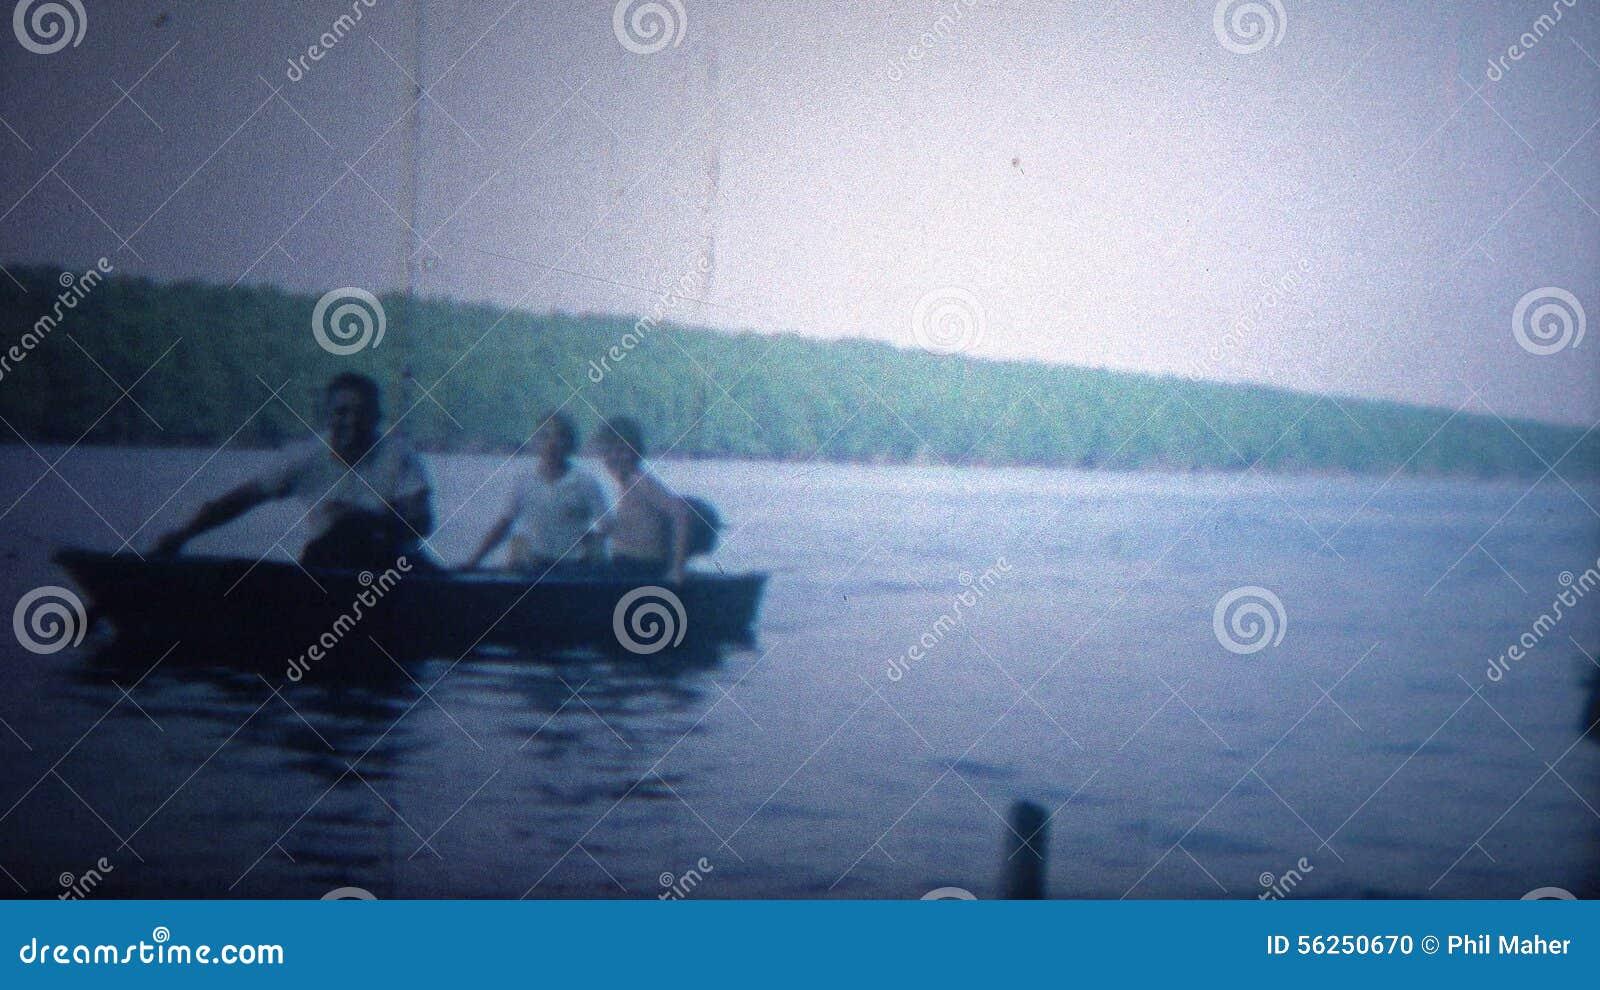 boat trip full movie download in hd